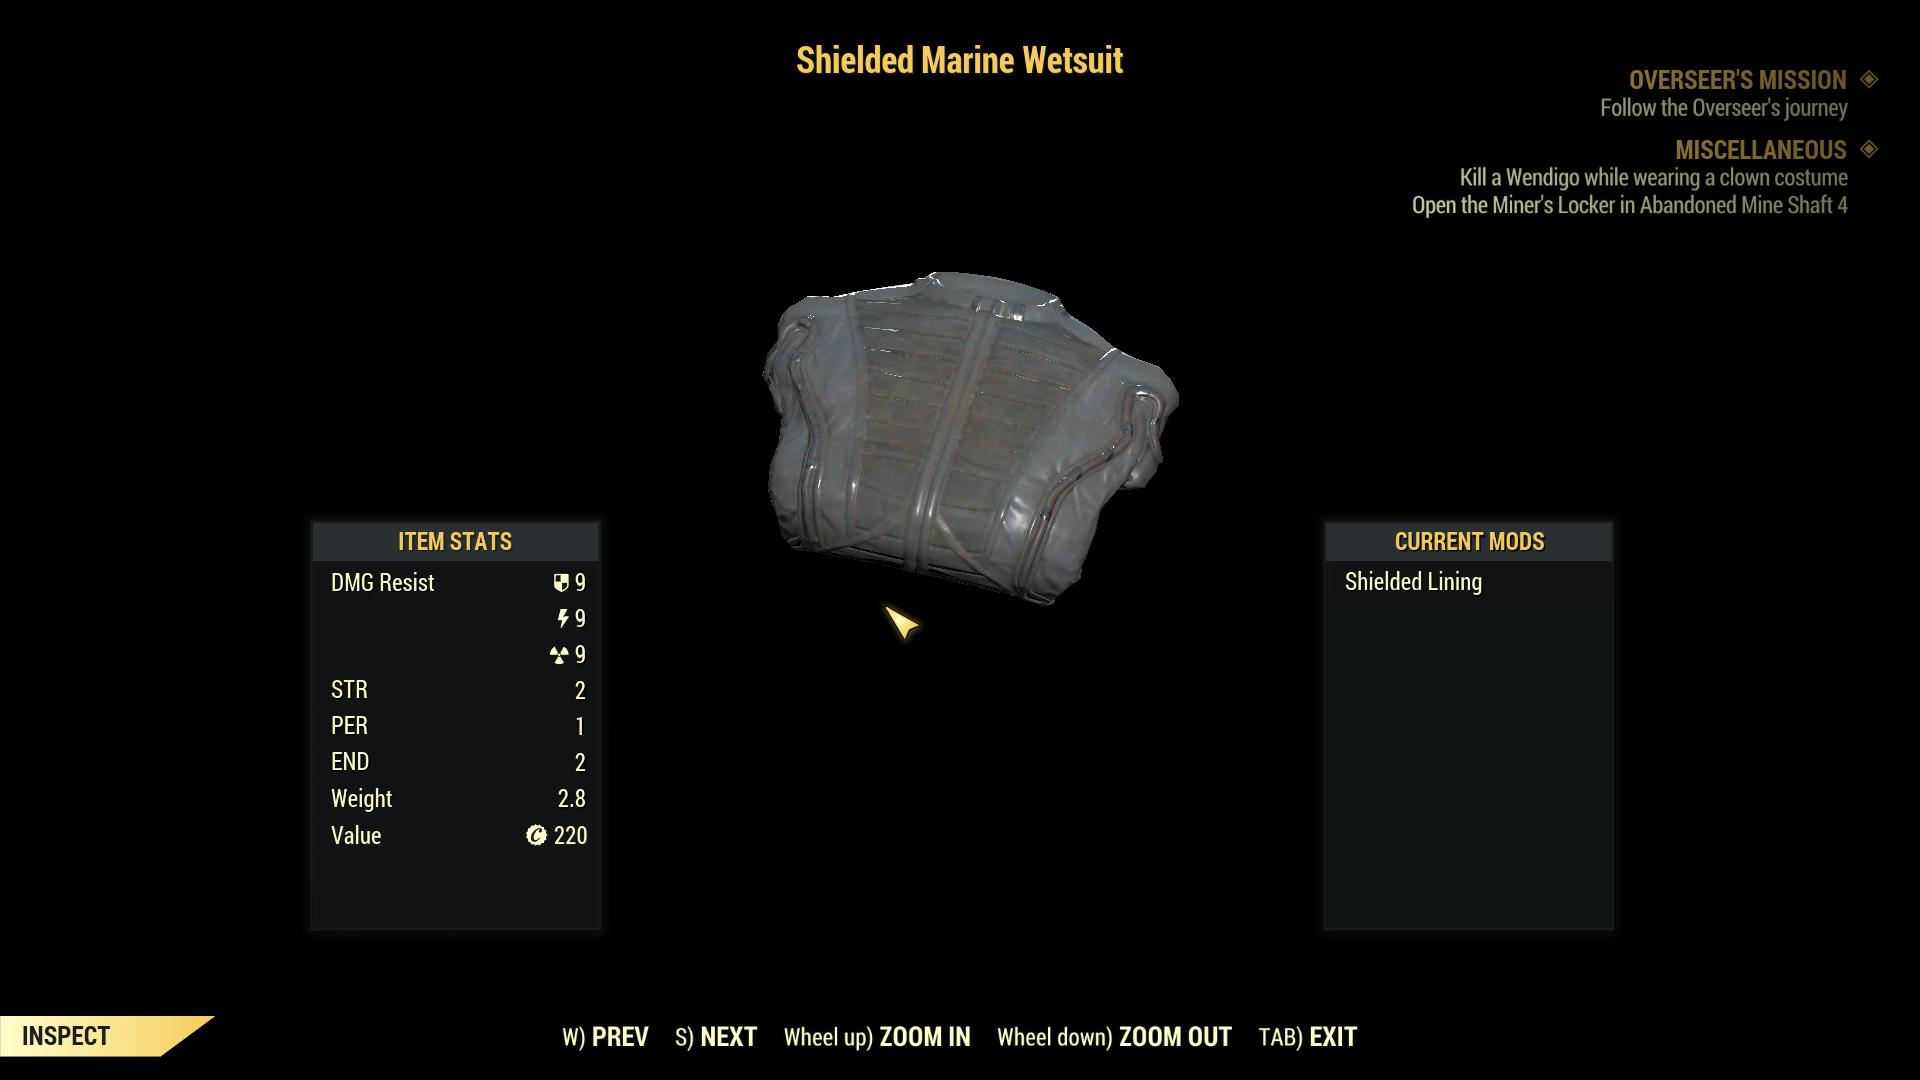 Shielded Marine Wetsuit   FAST   STRESS FREE   CHEAP   MAX LVL  